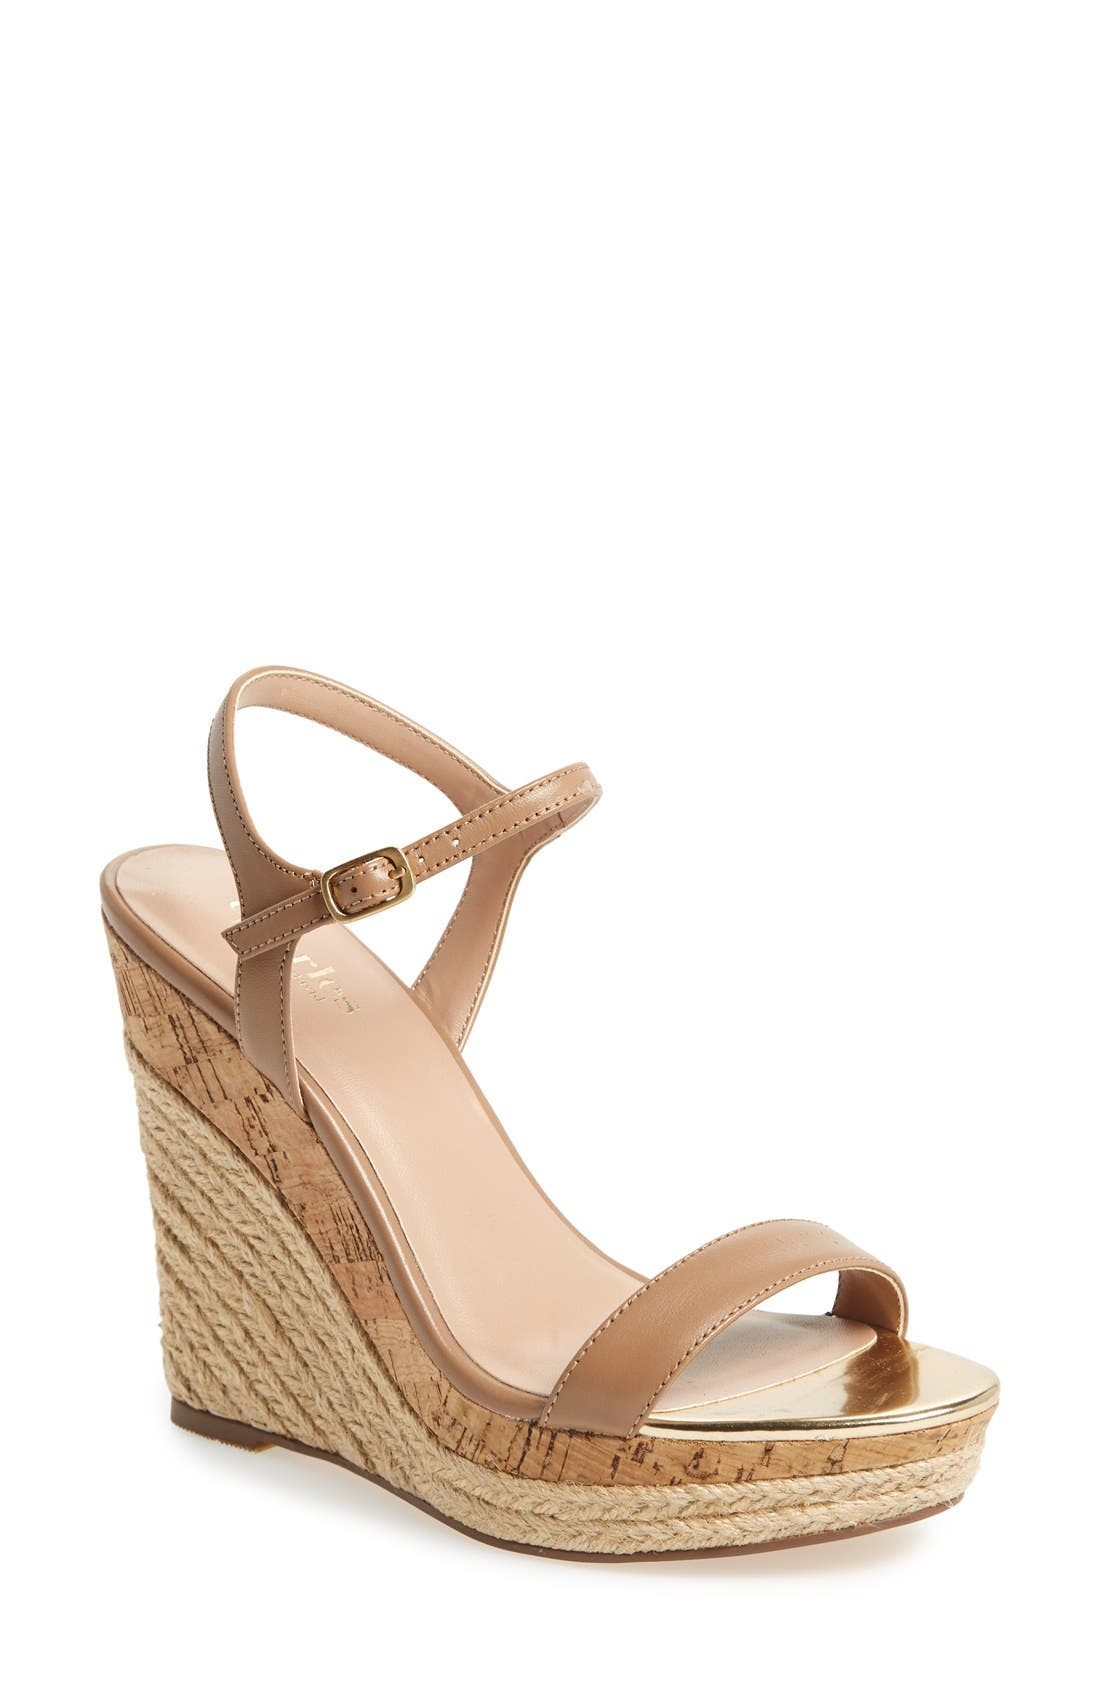 ,                             'Alabama' Espadrille Wedge Sandal,                             Main thumbnail 9, color,                             250